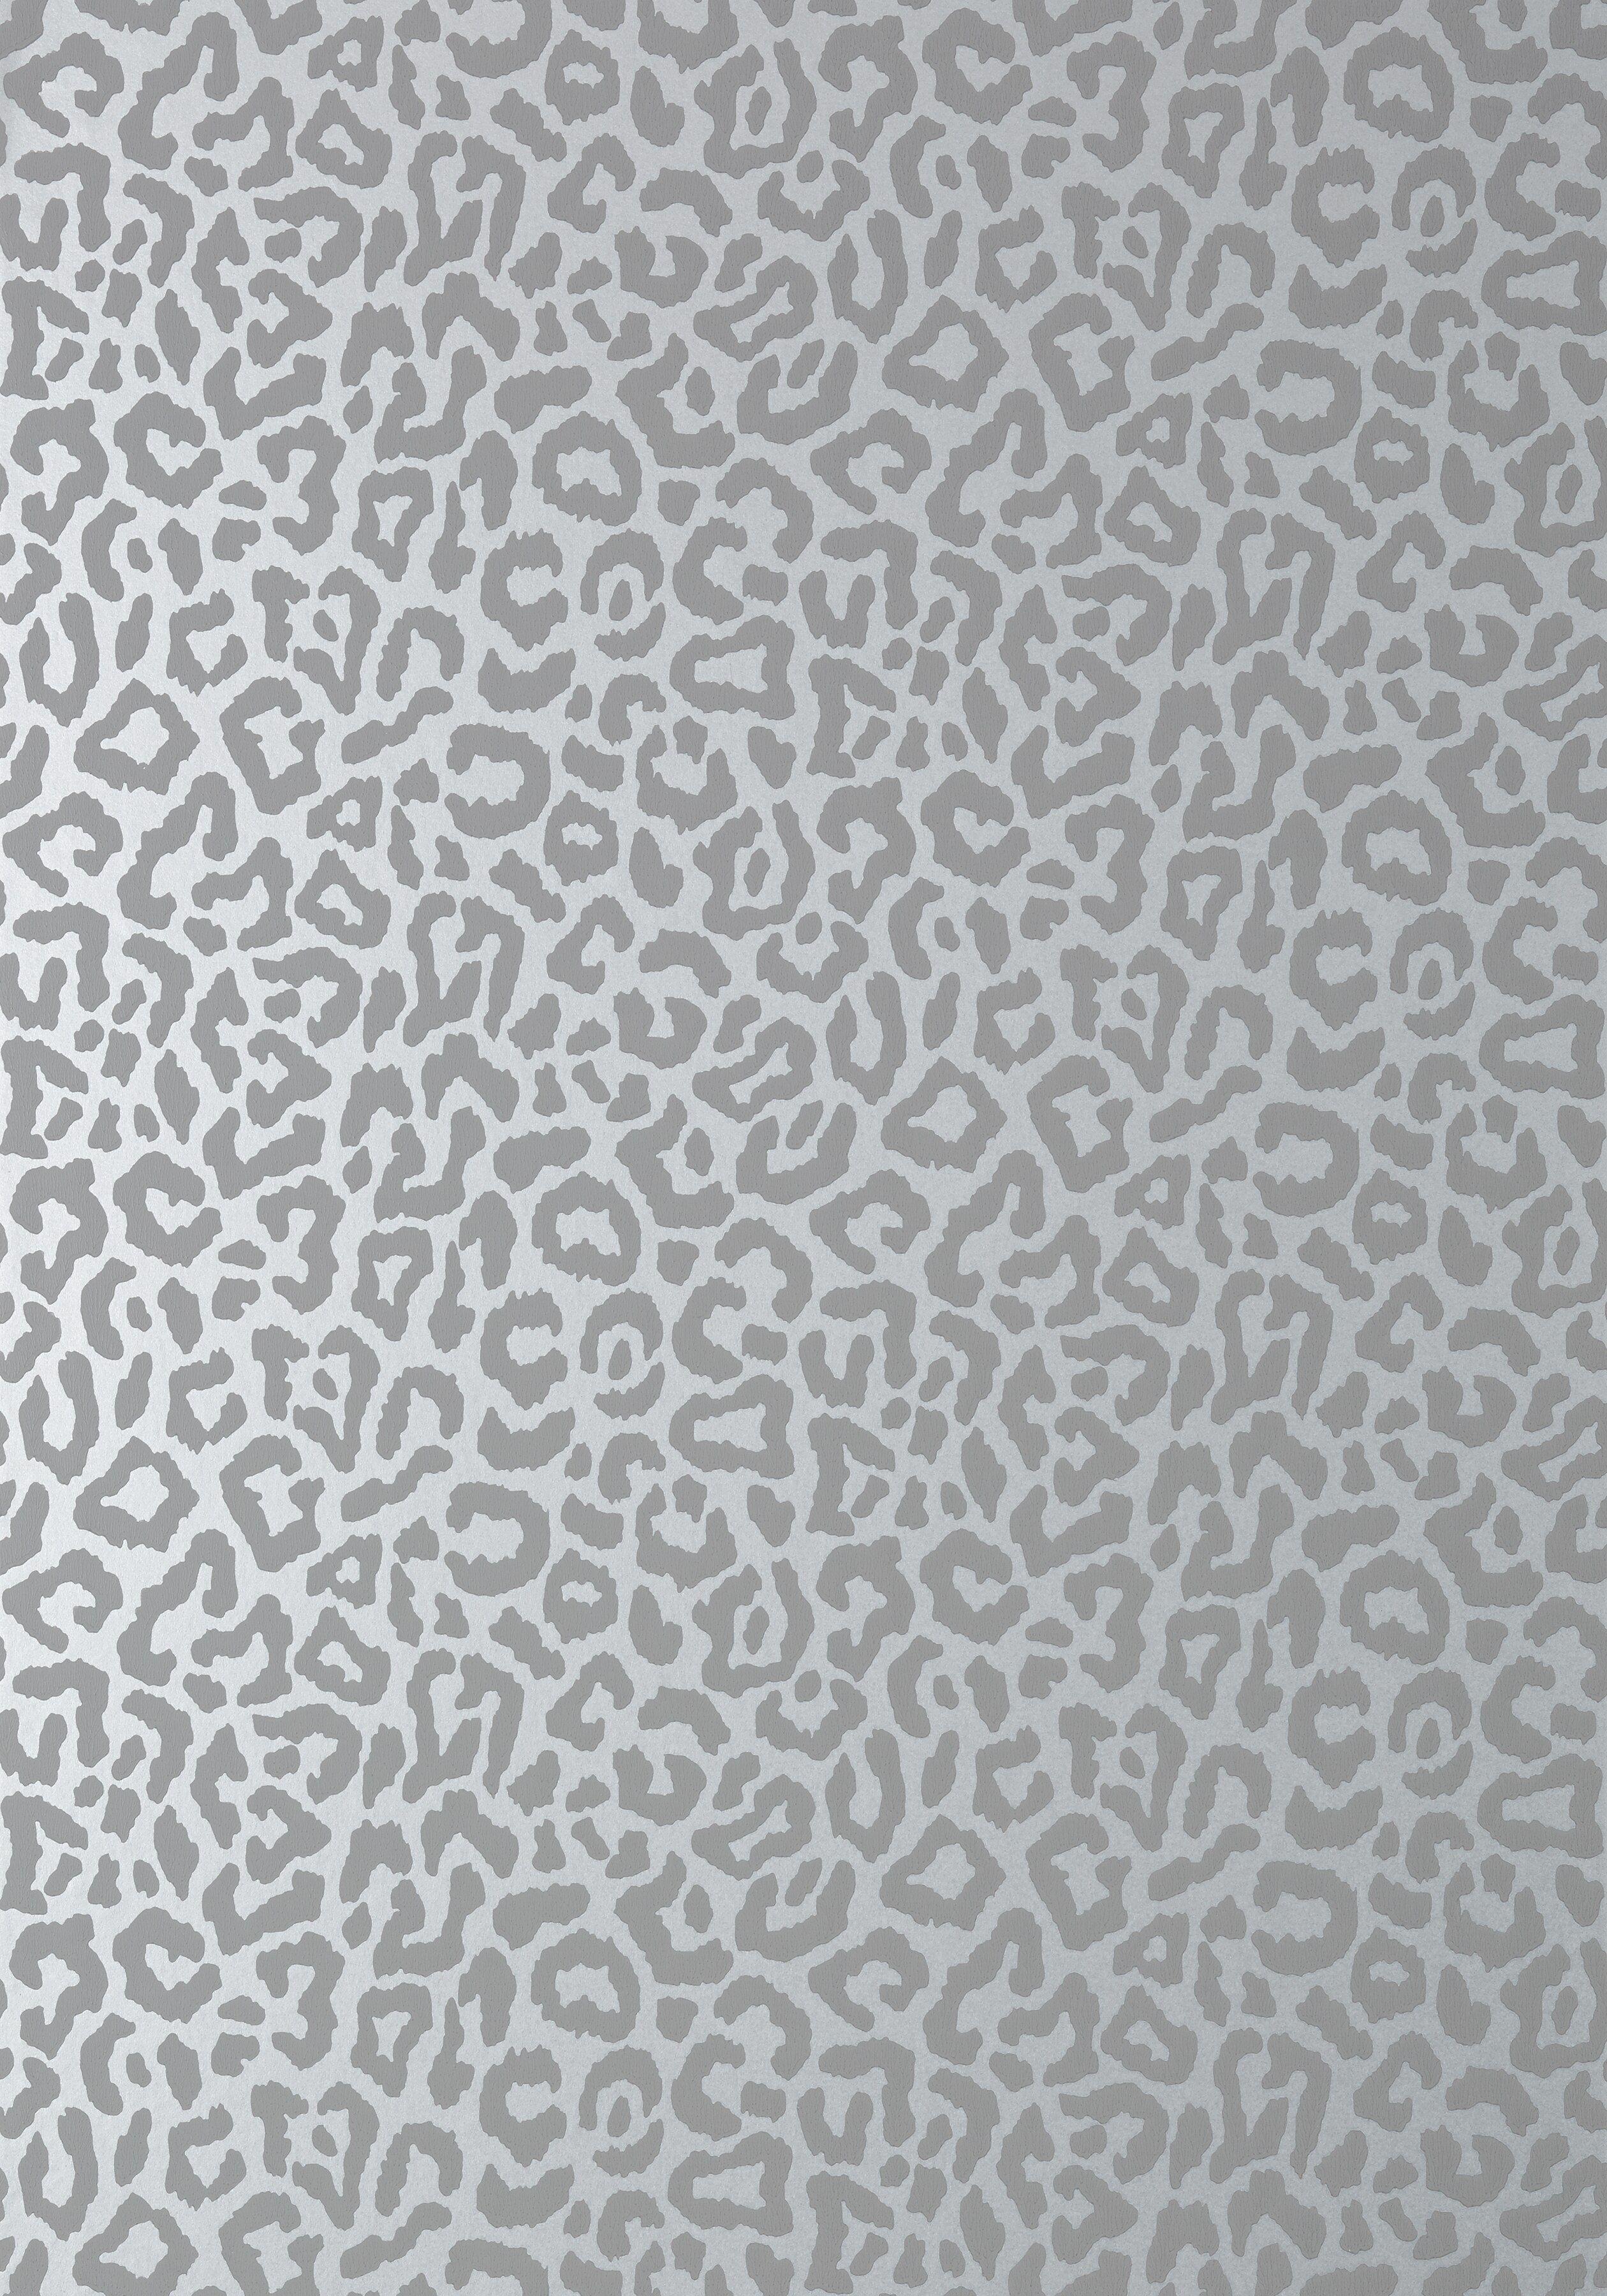 Javan metallic silver in 2020 Leopard print wallpaper